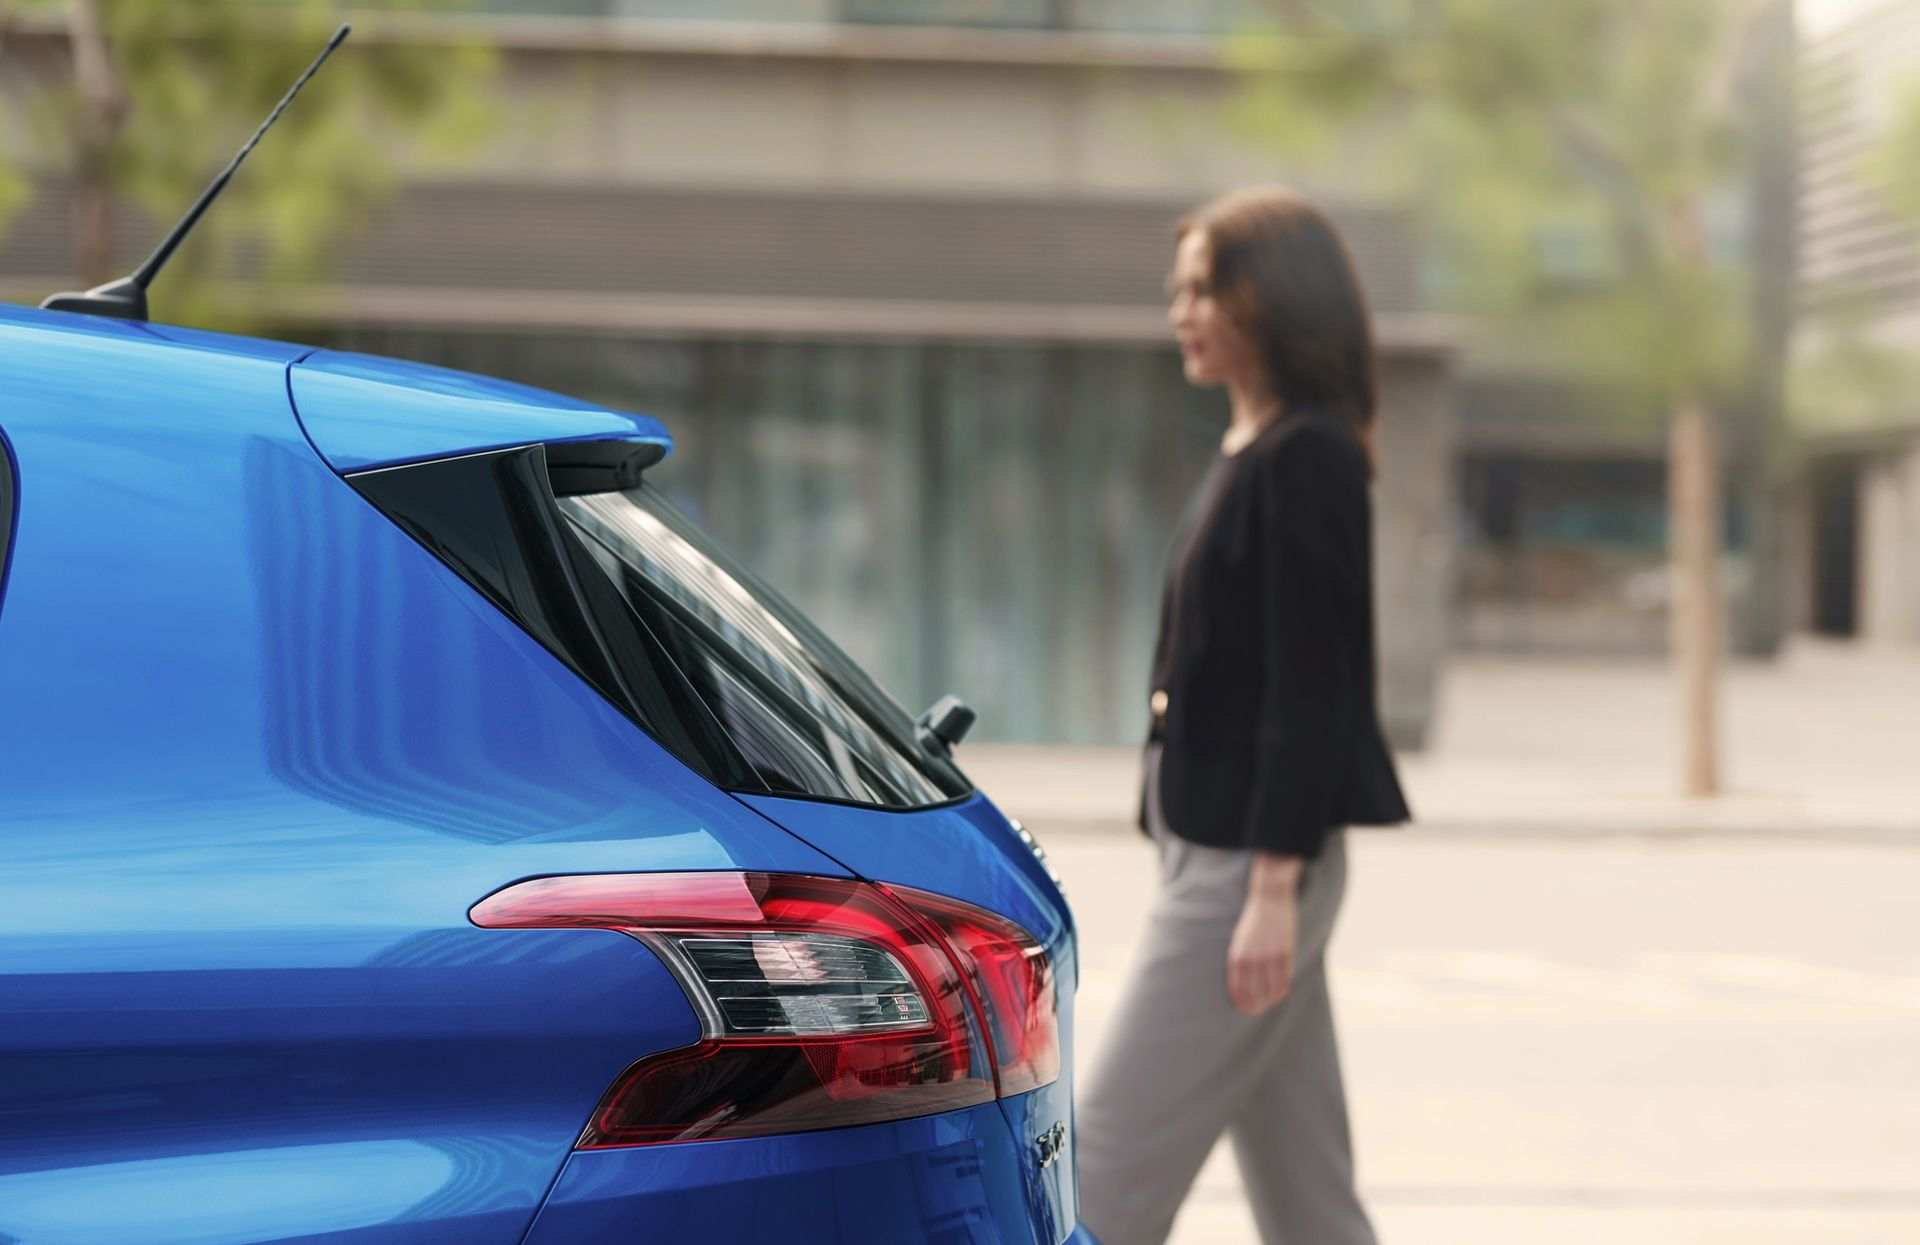 2020_Peugeot_308_facelift_0007